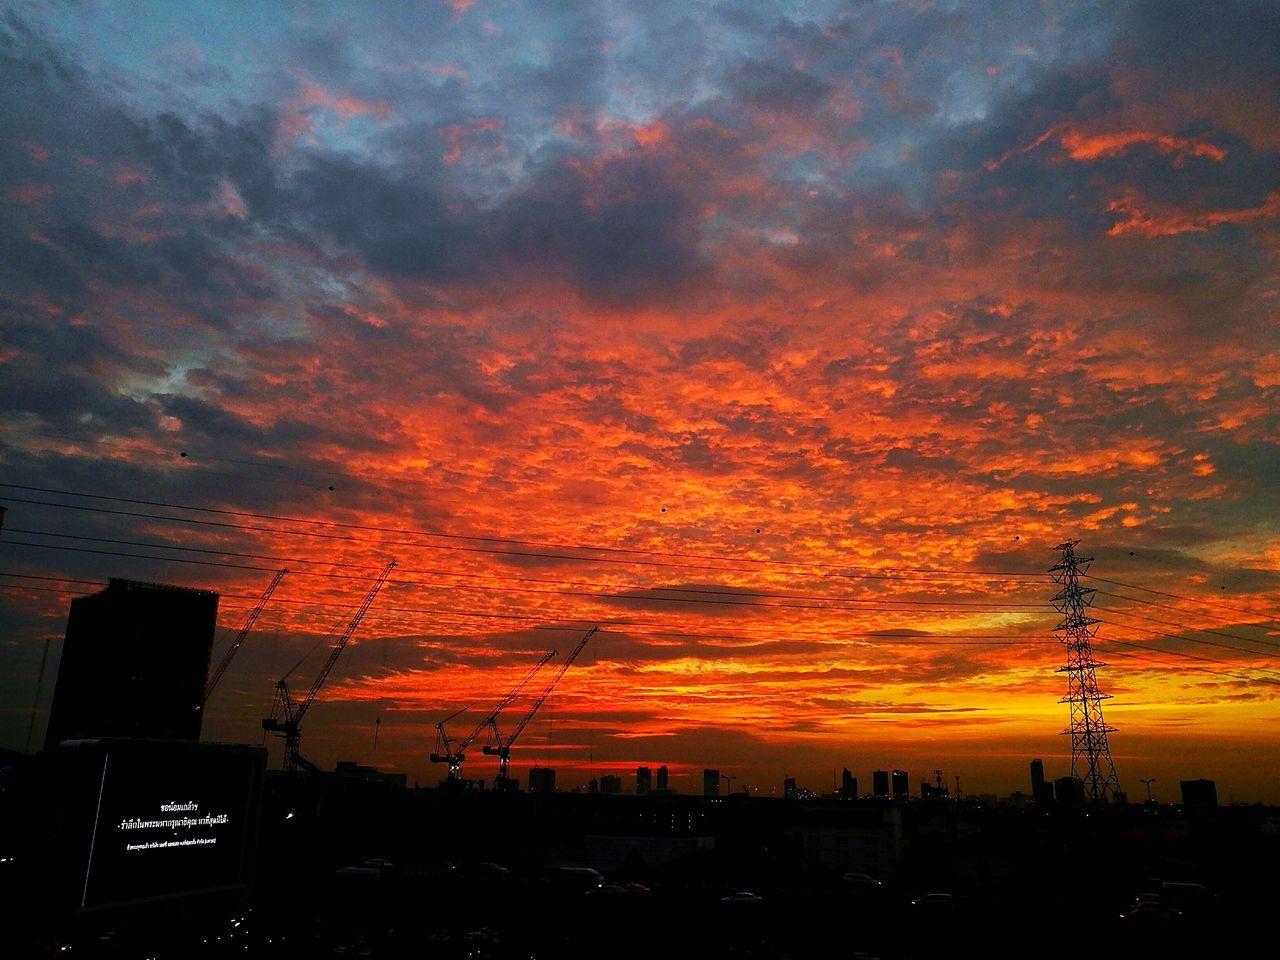 sunset, orange color, silhouette, architecture, built structure, dramatic sky, building exterior, sky, no people, city, cloud - sky, outdoors, travel destinations, beauty in nature, nature, cityscape, skyscraper, urban skyline